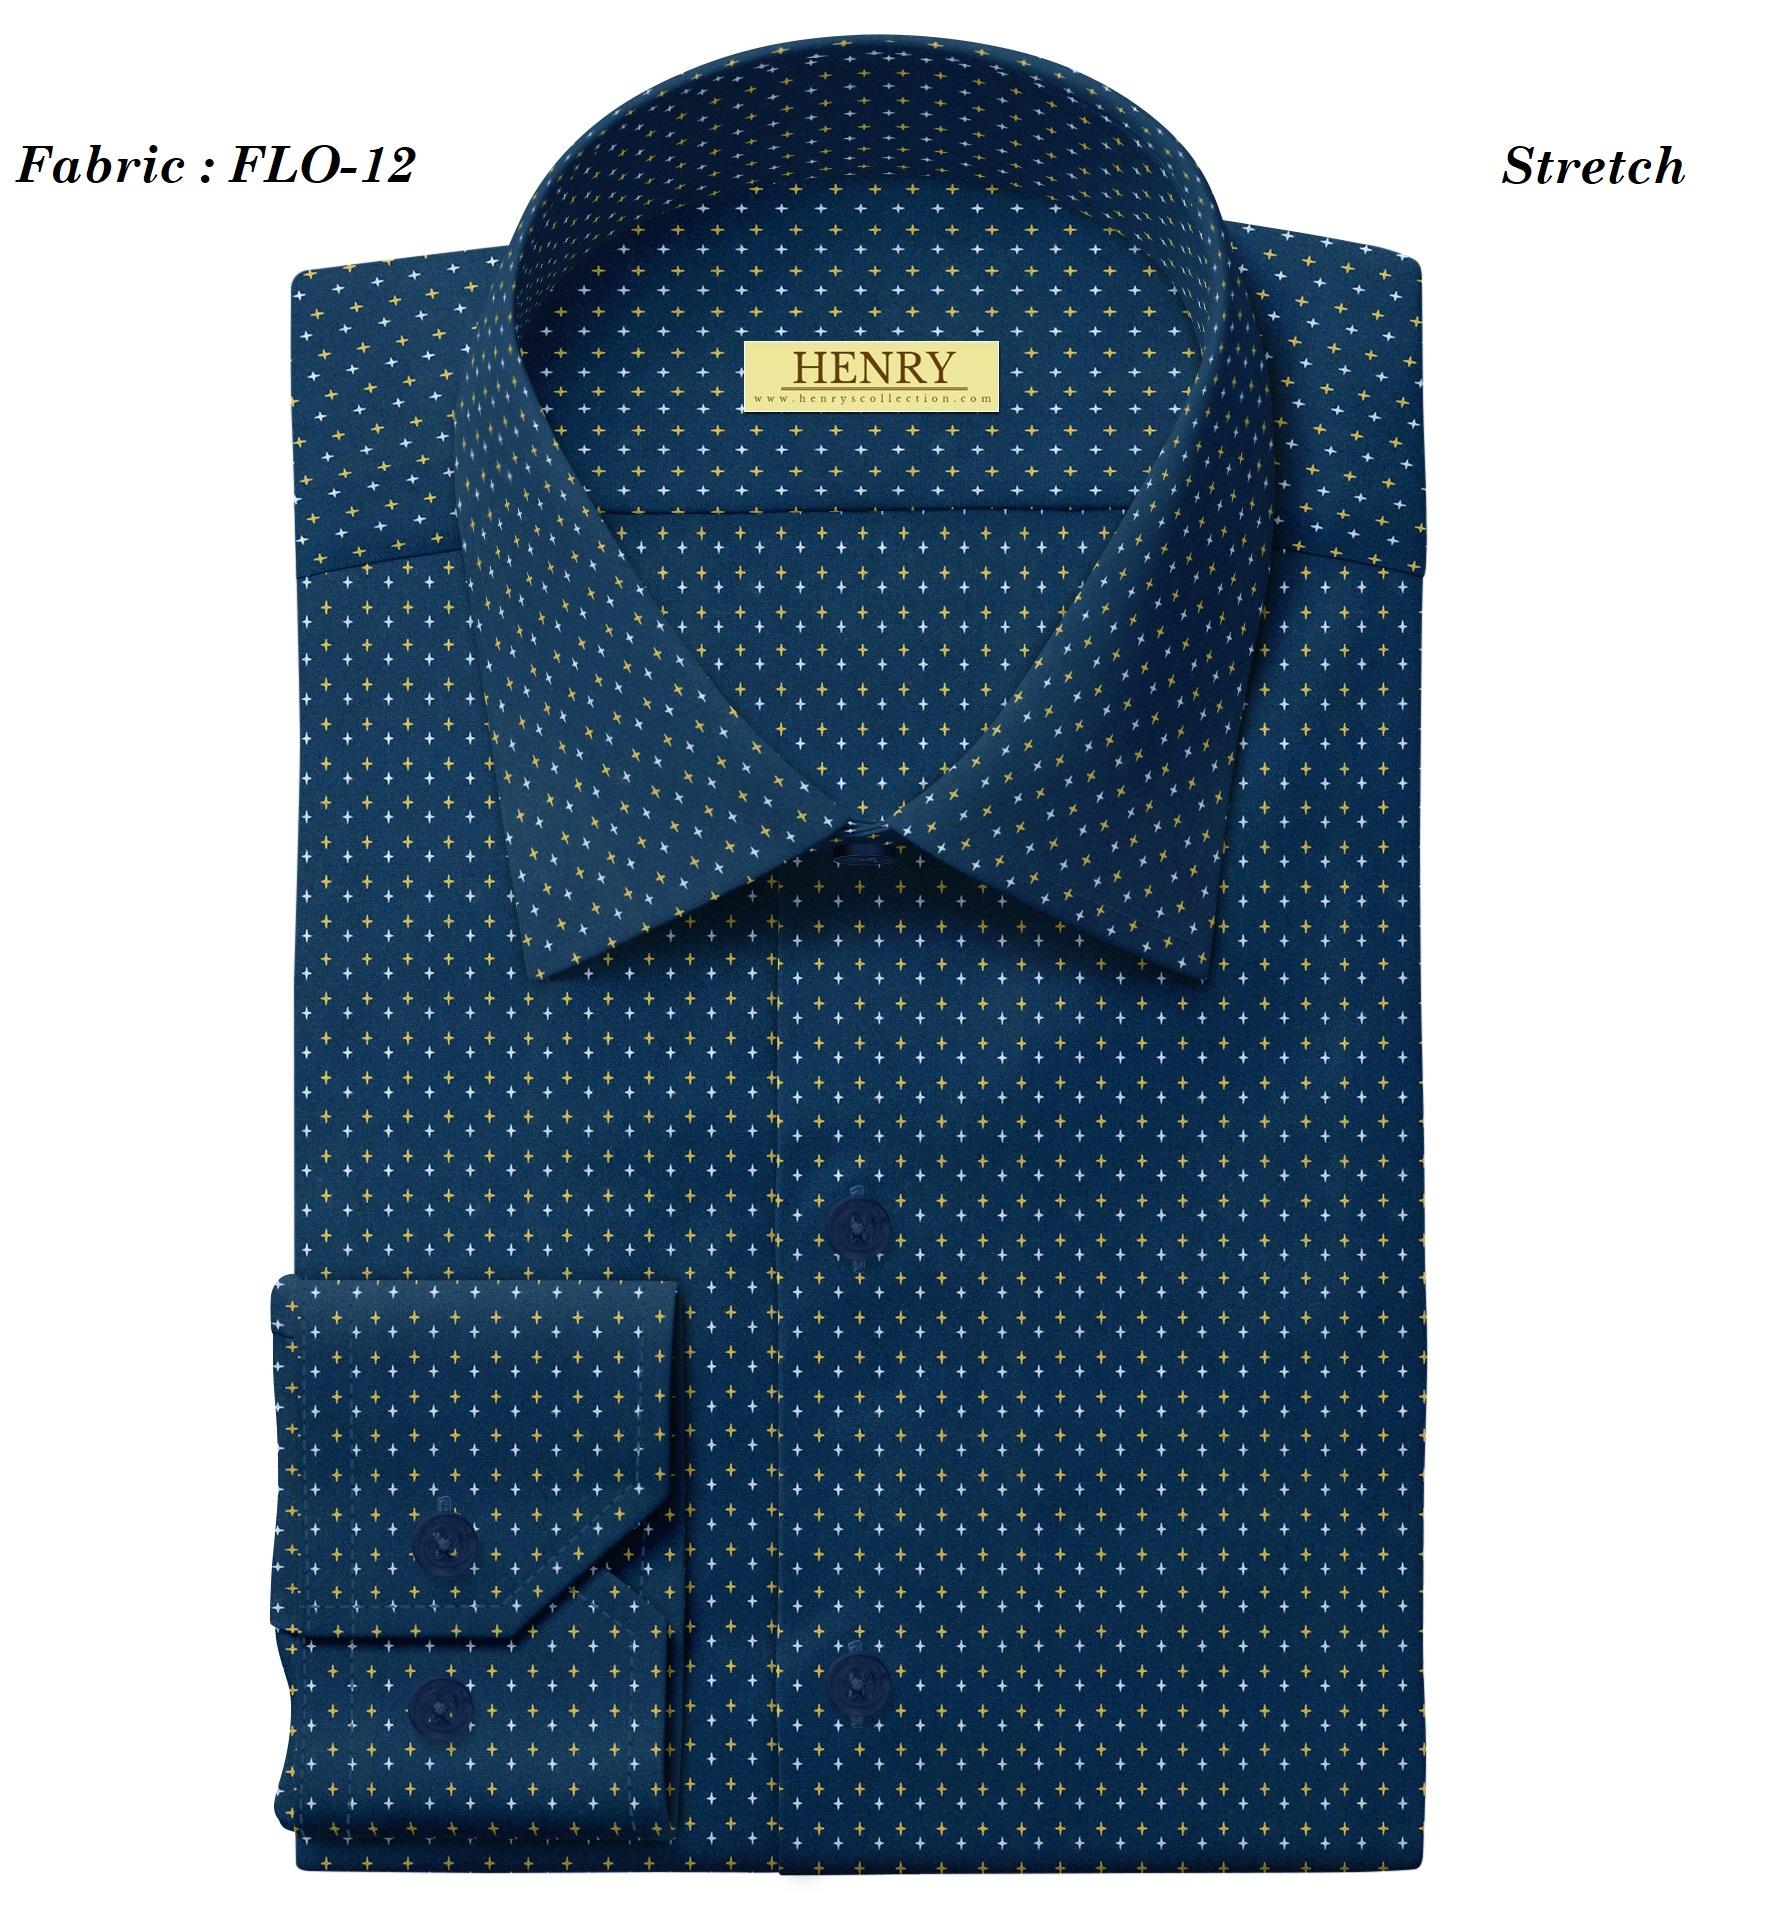 (159) FLO-12 Stretch